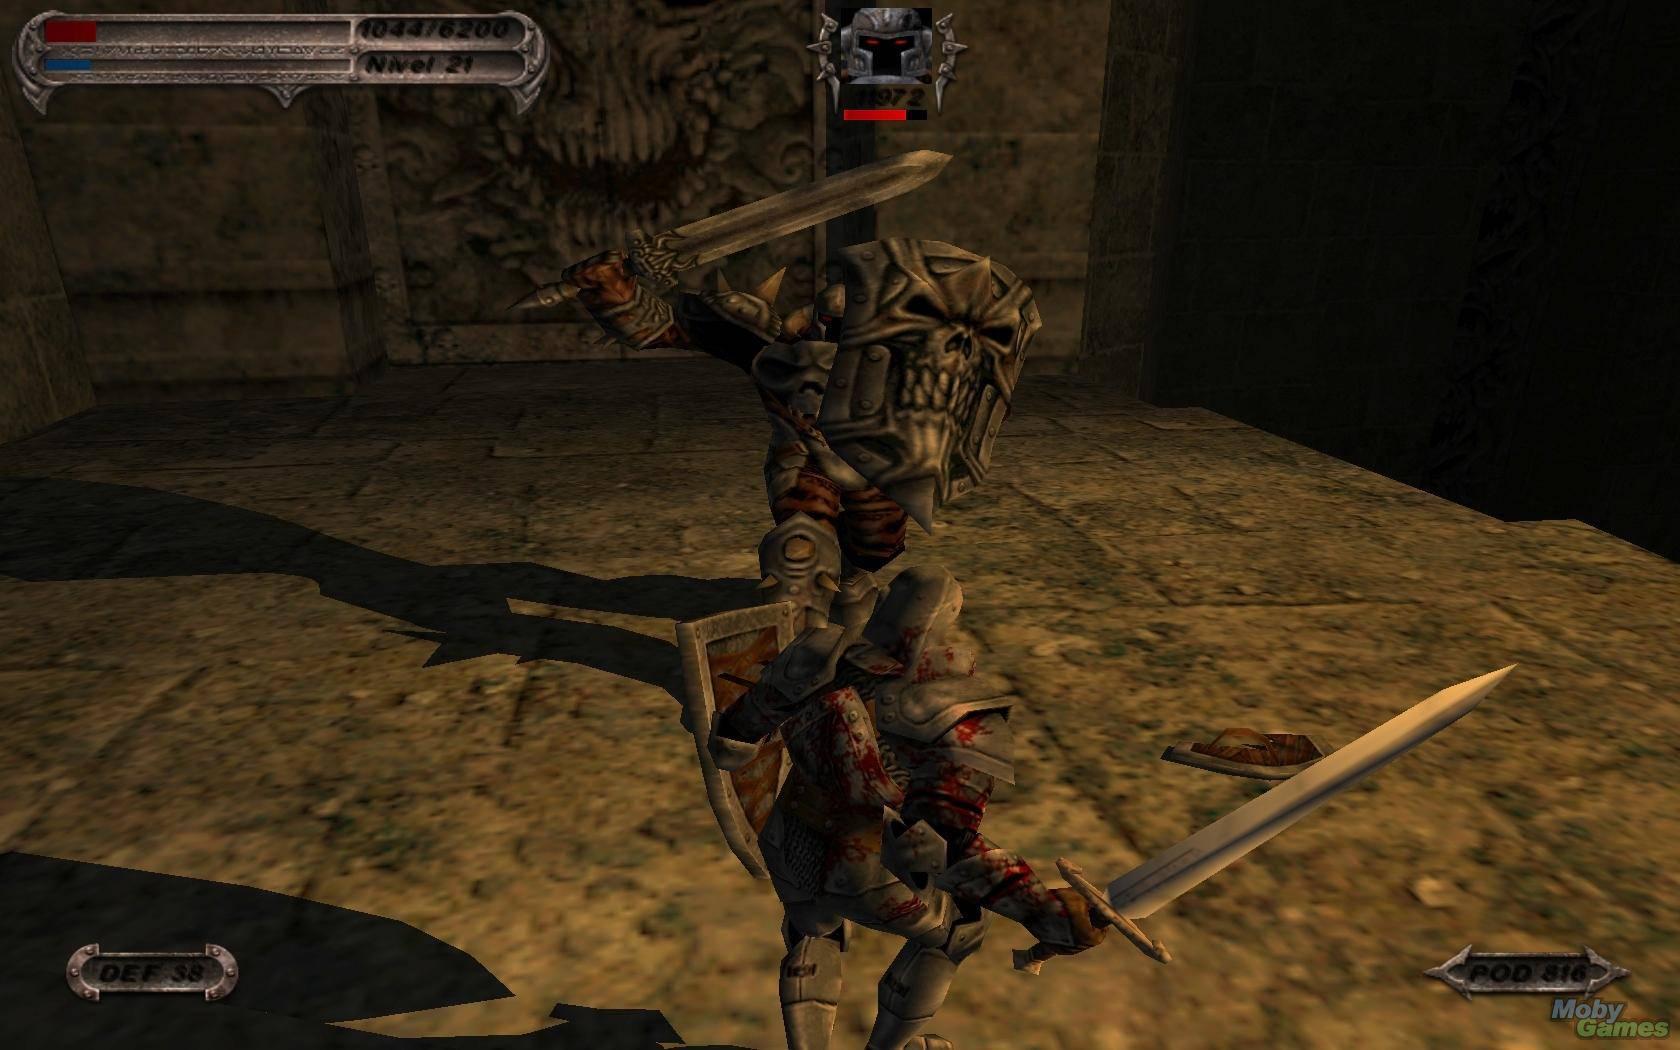 blade-of-darkness_31.jpg